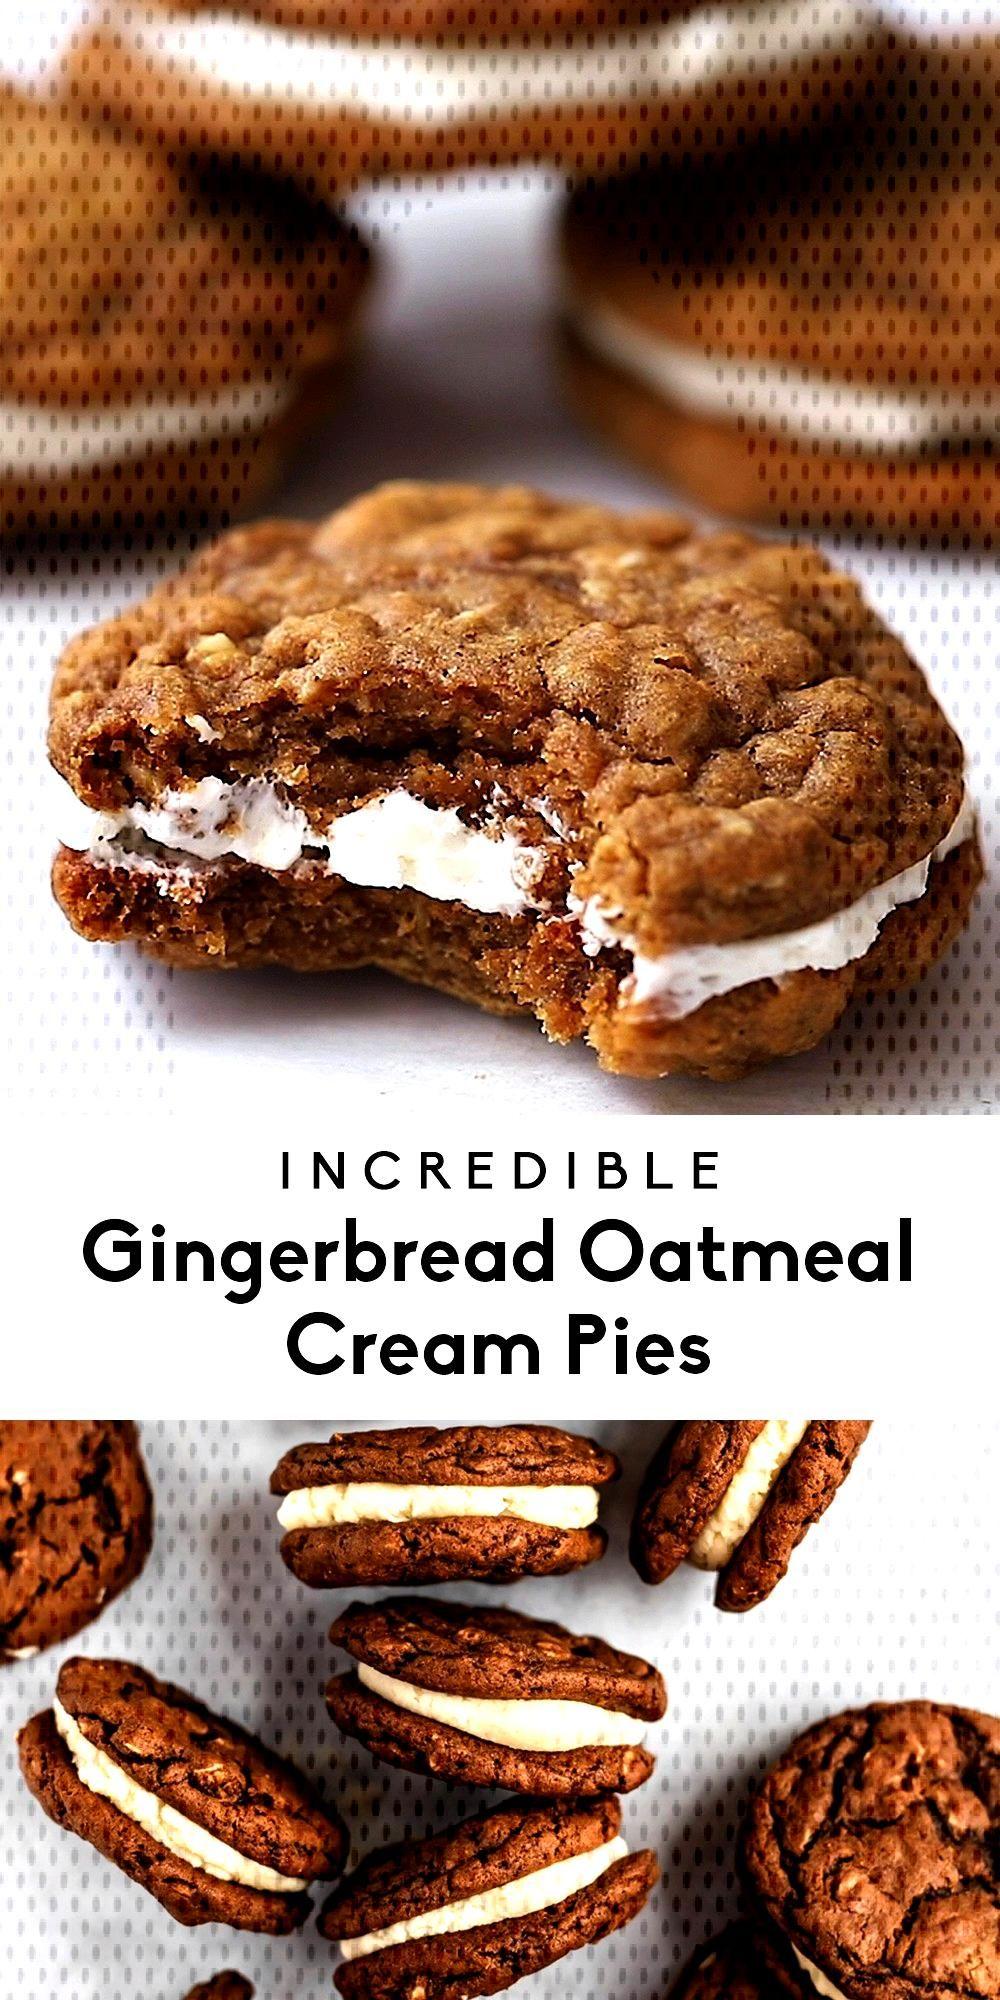 Incredible Gingerbread Oatmeal Cream Pies - Recipes -